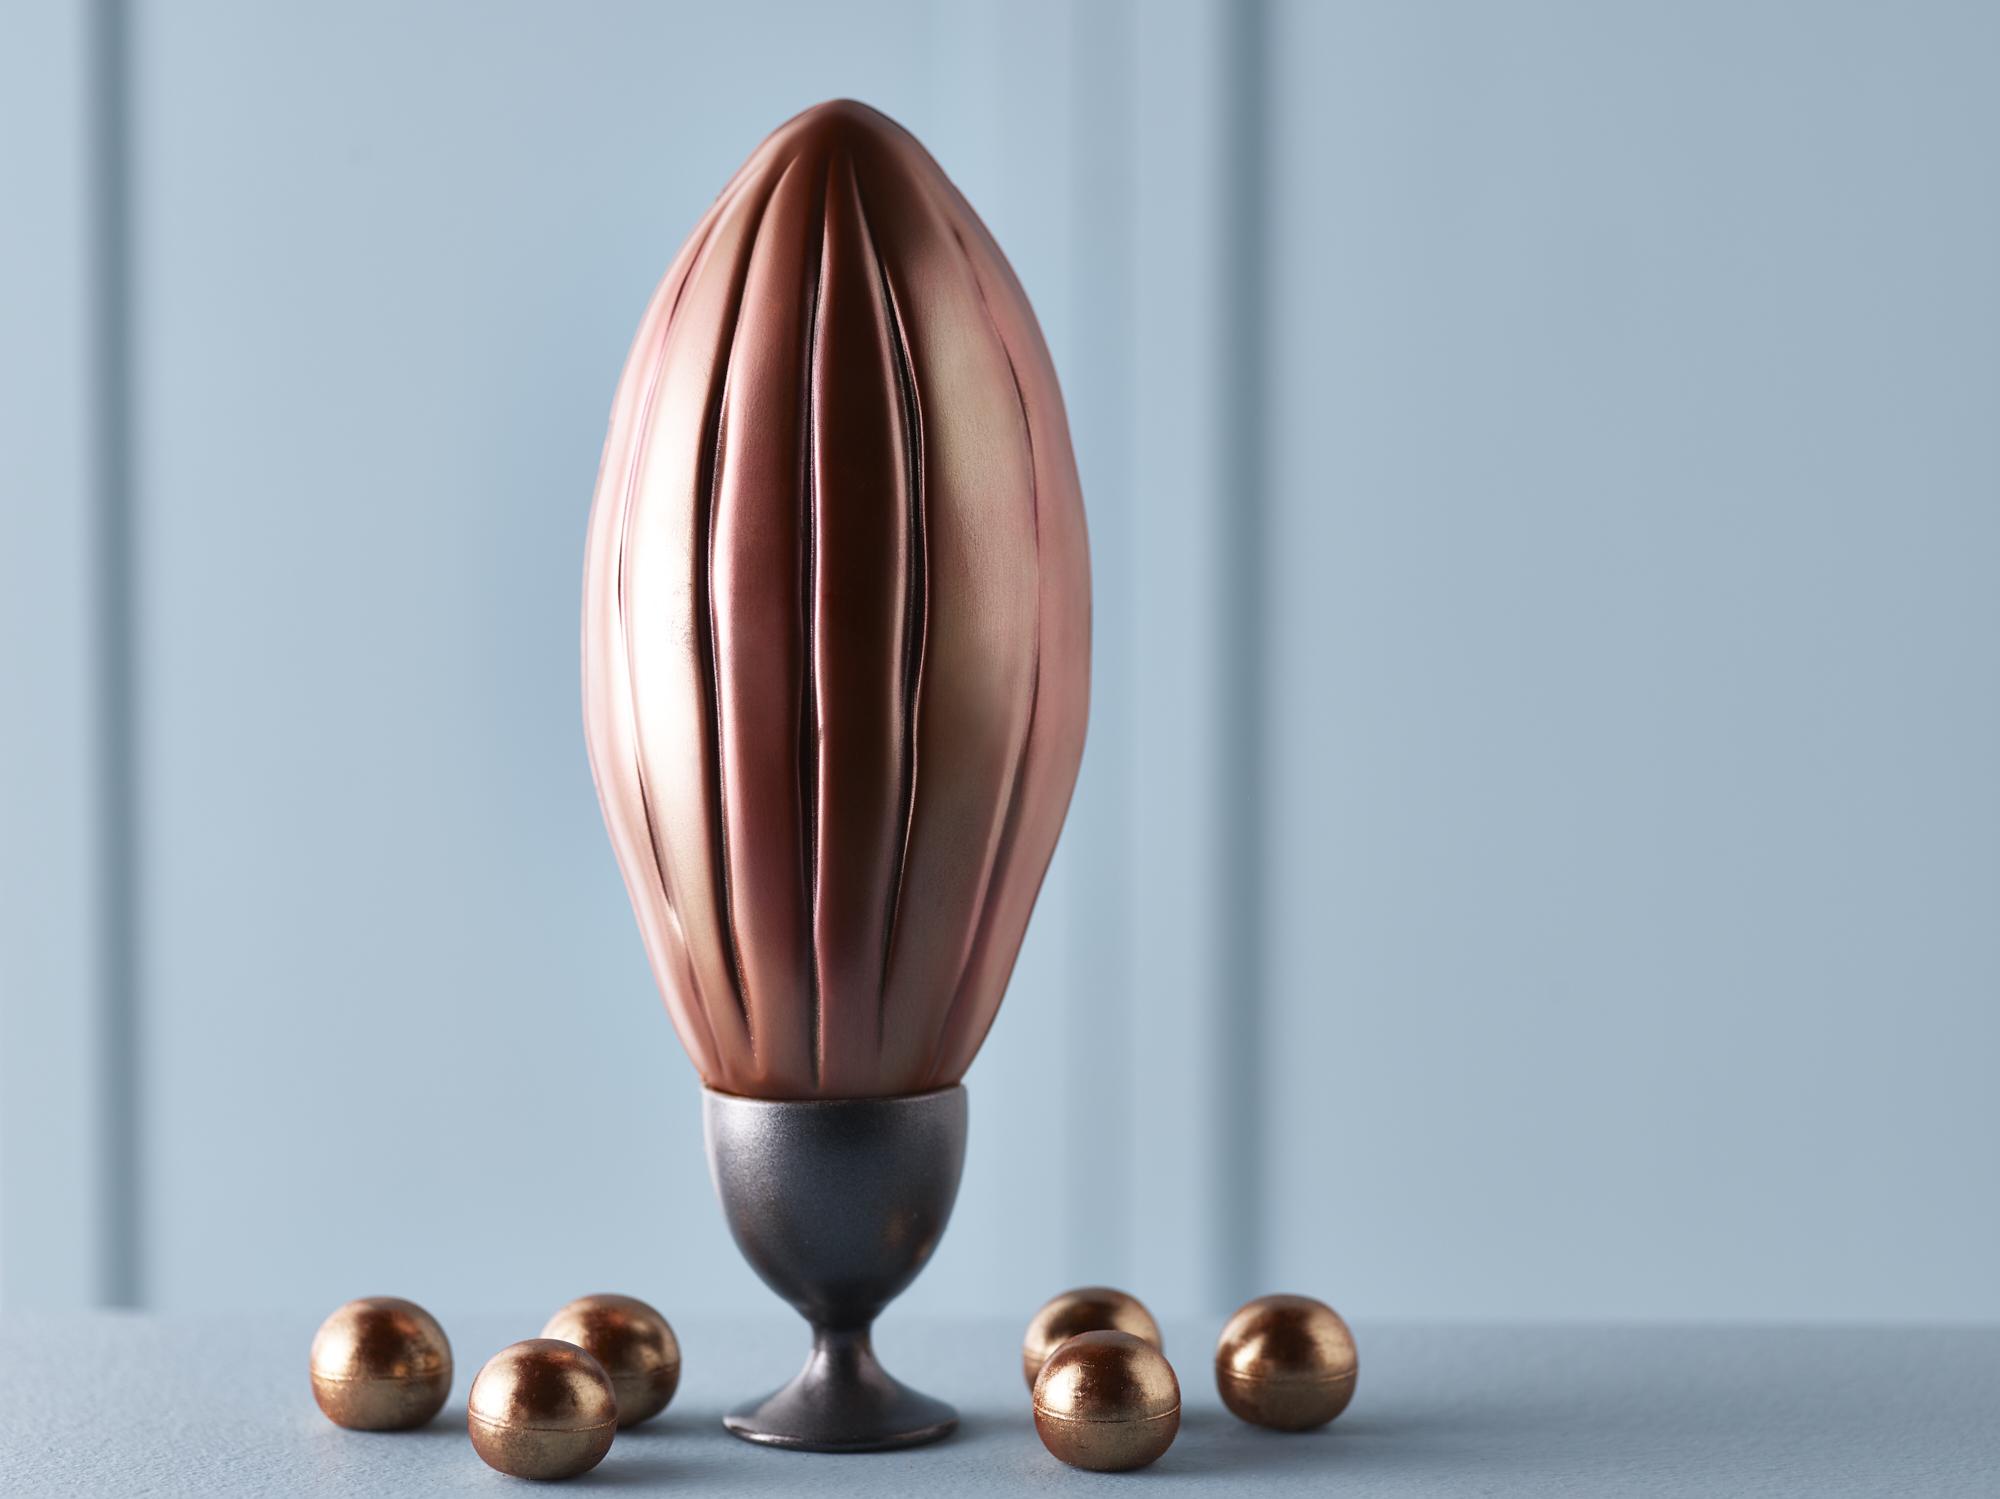 Co-op Irresistible Single Origin Ecuadorian Milk Chocolate Cocoa Pod, with silky smooth milk chocolate truffles 300g — £7.00